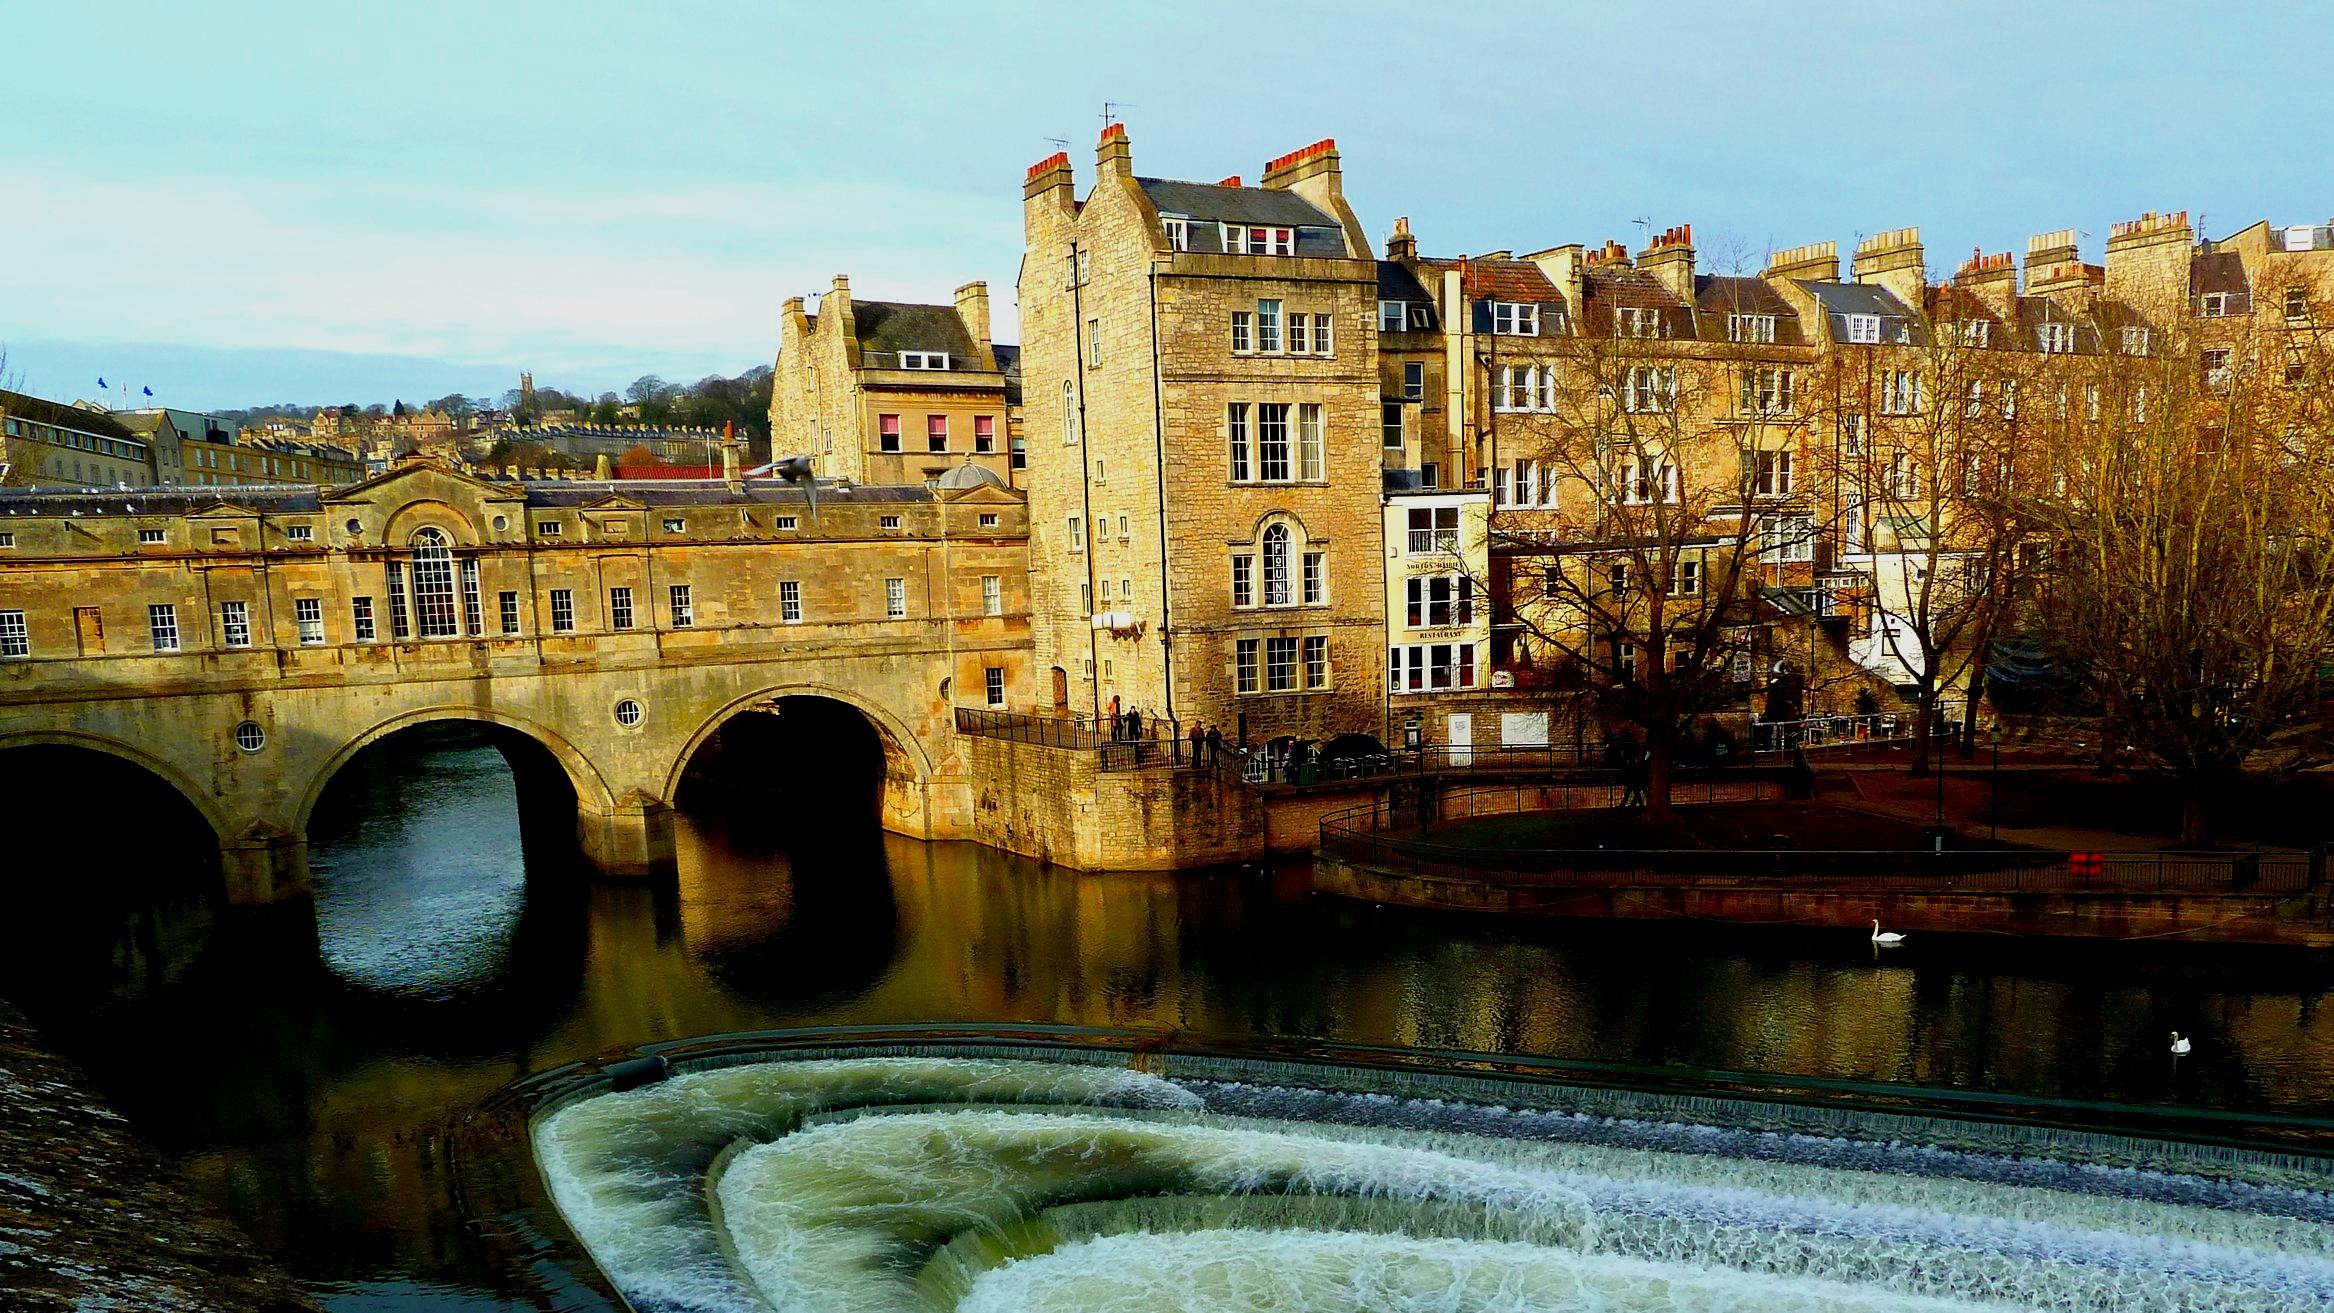 Bath, England - July 11-14, 2016   Chairs: Chris Bailey (UK) / Eamonn Kelly (UK) / Graeme Henderson (UK)  Young Investigator Award:  Dr Amynah Pradhan   Founders' Award:  Pr Lakshmi Devi